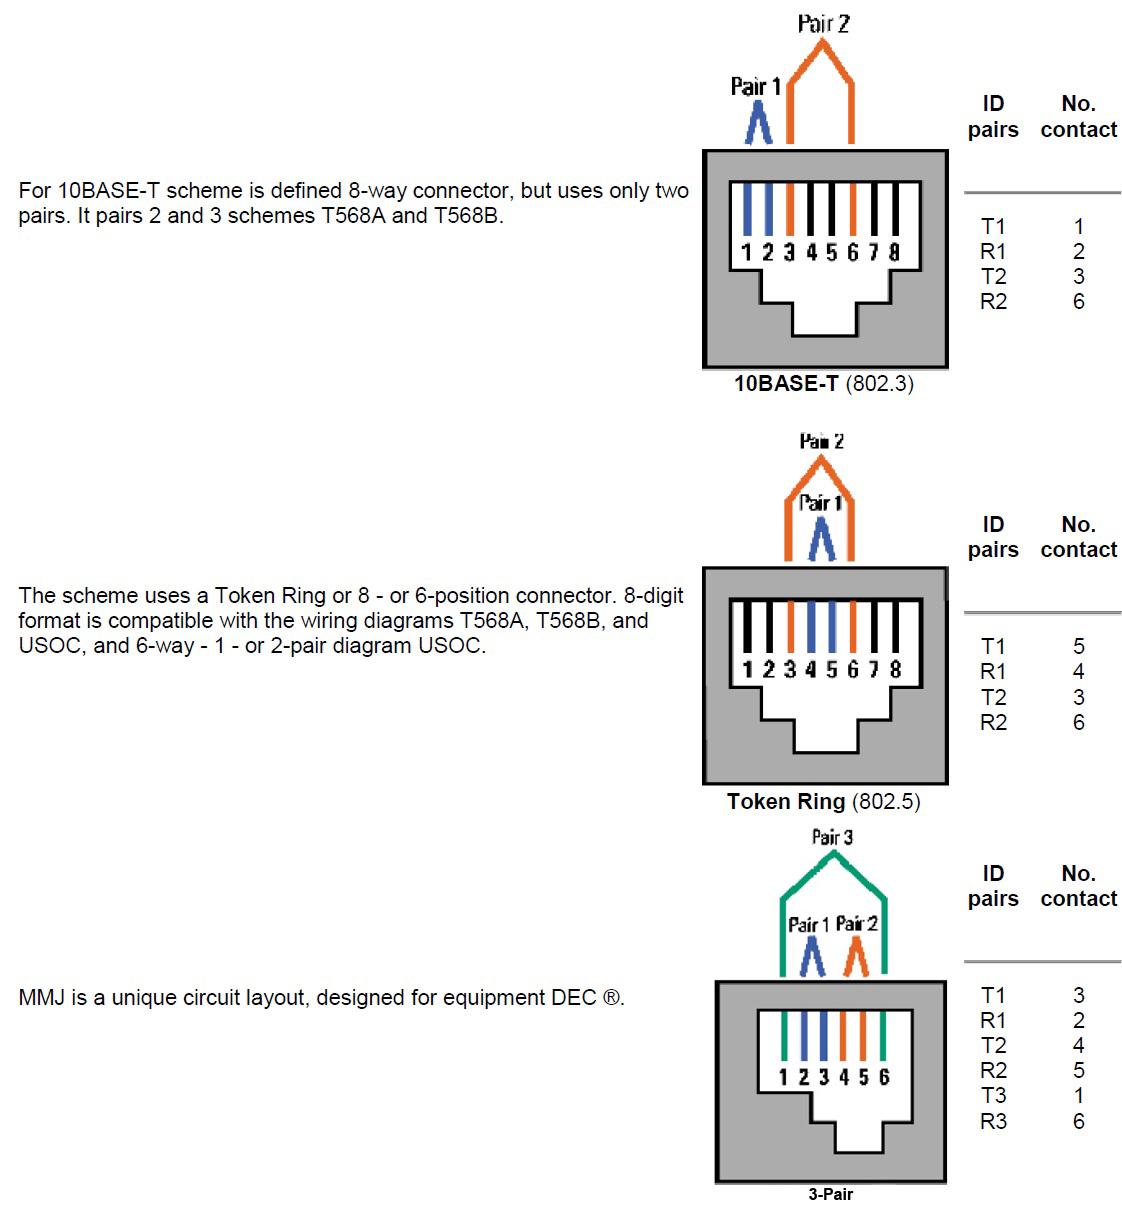 Rj45 Rj11 Wiring Color Code - Wiring Diagrams Hubs - Rj11 Wiring Diagram Using Cat5